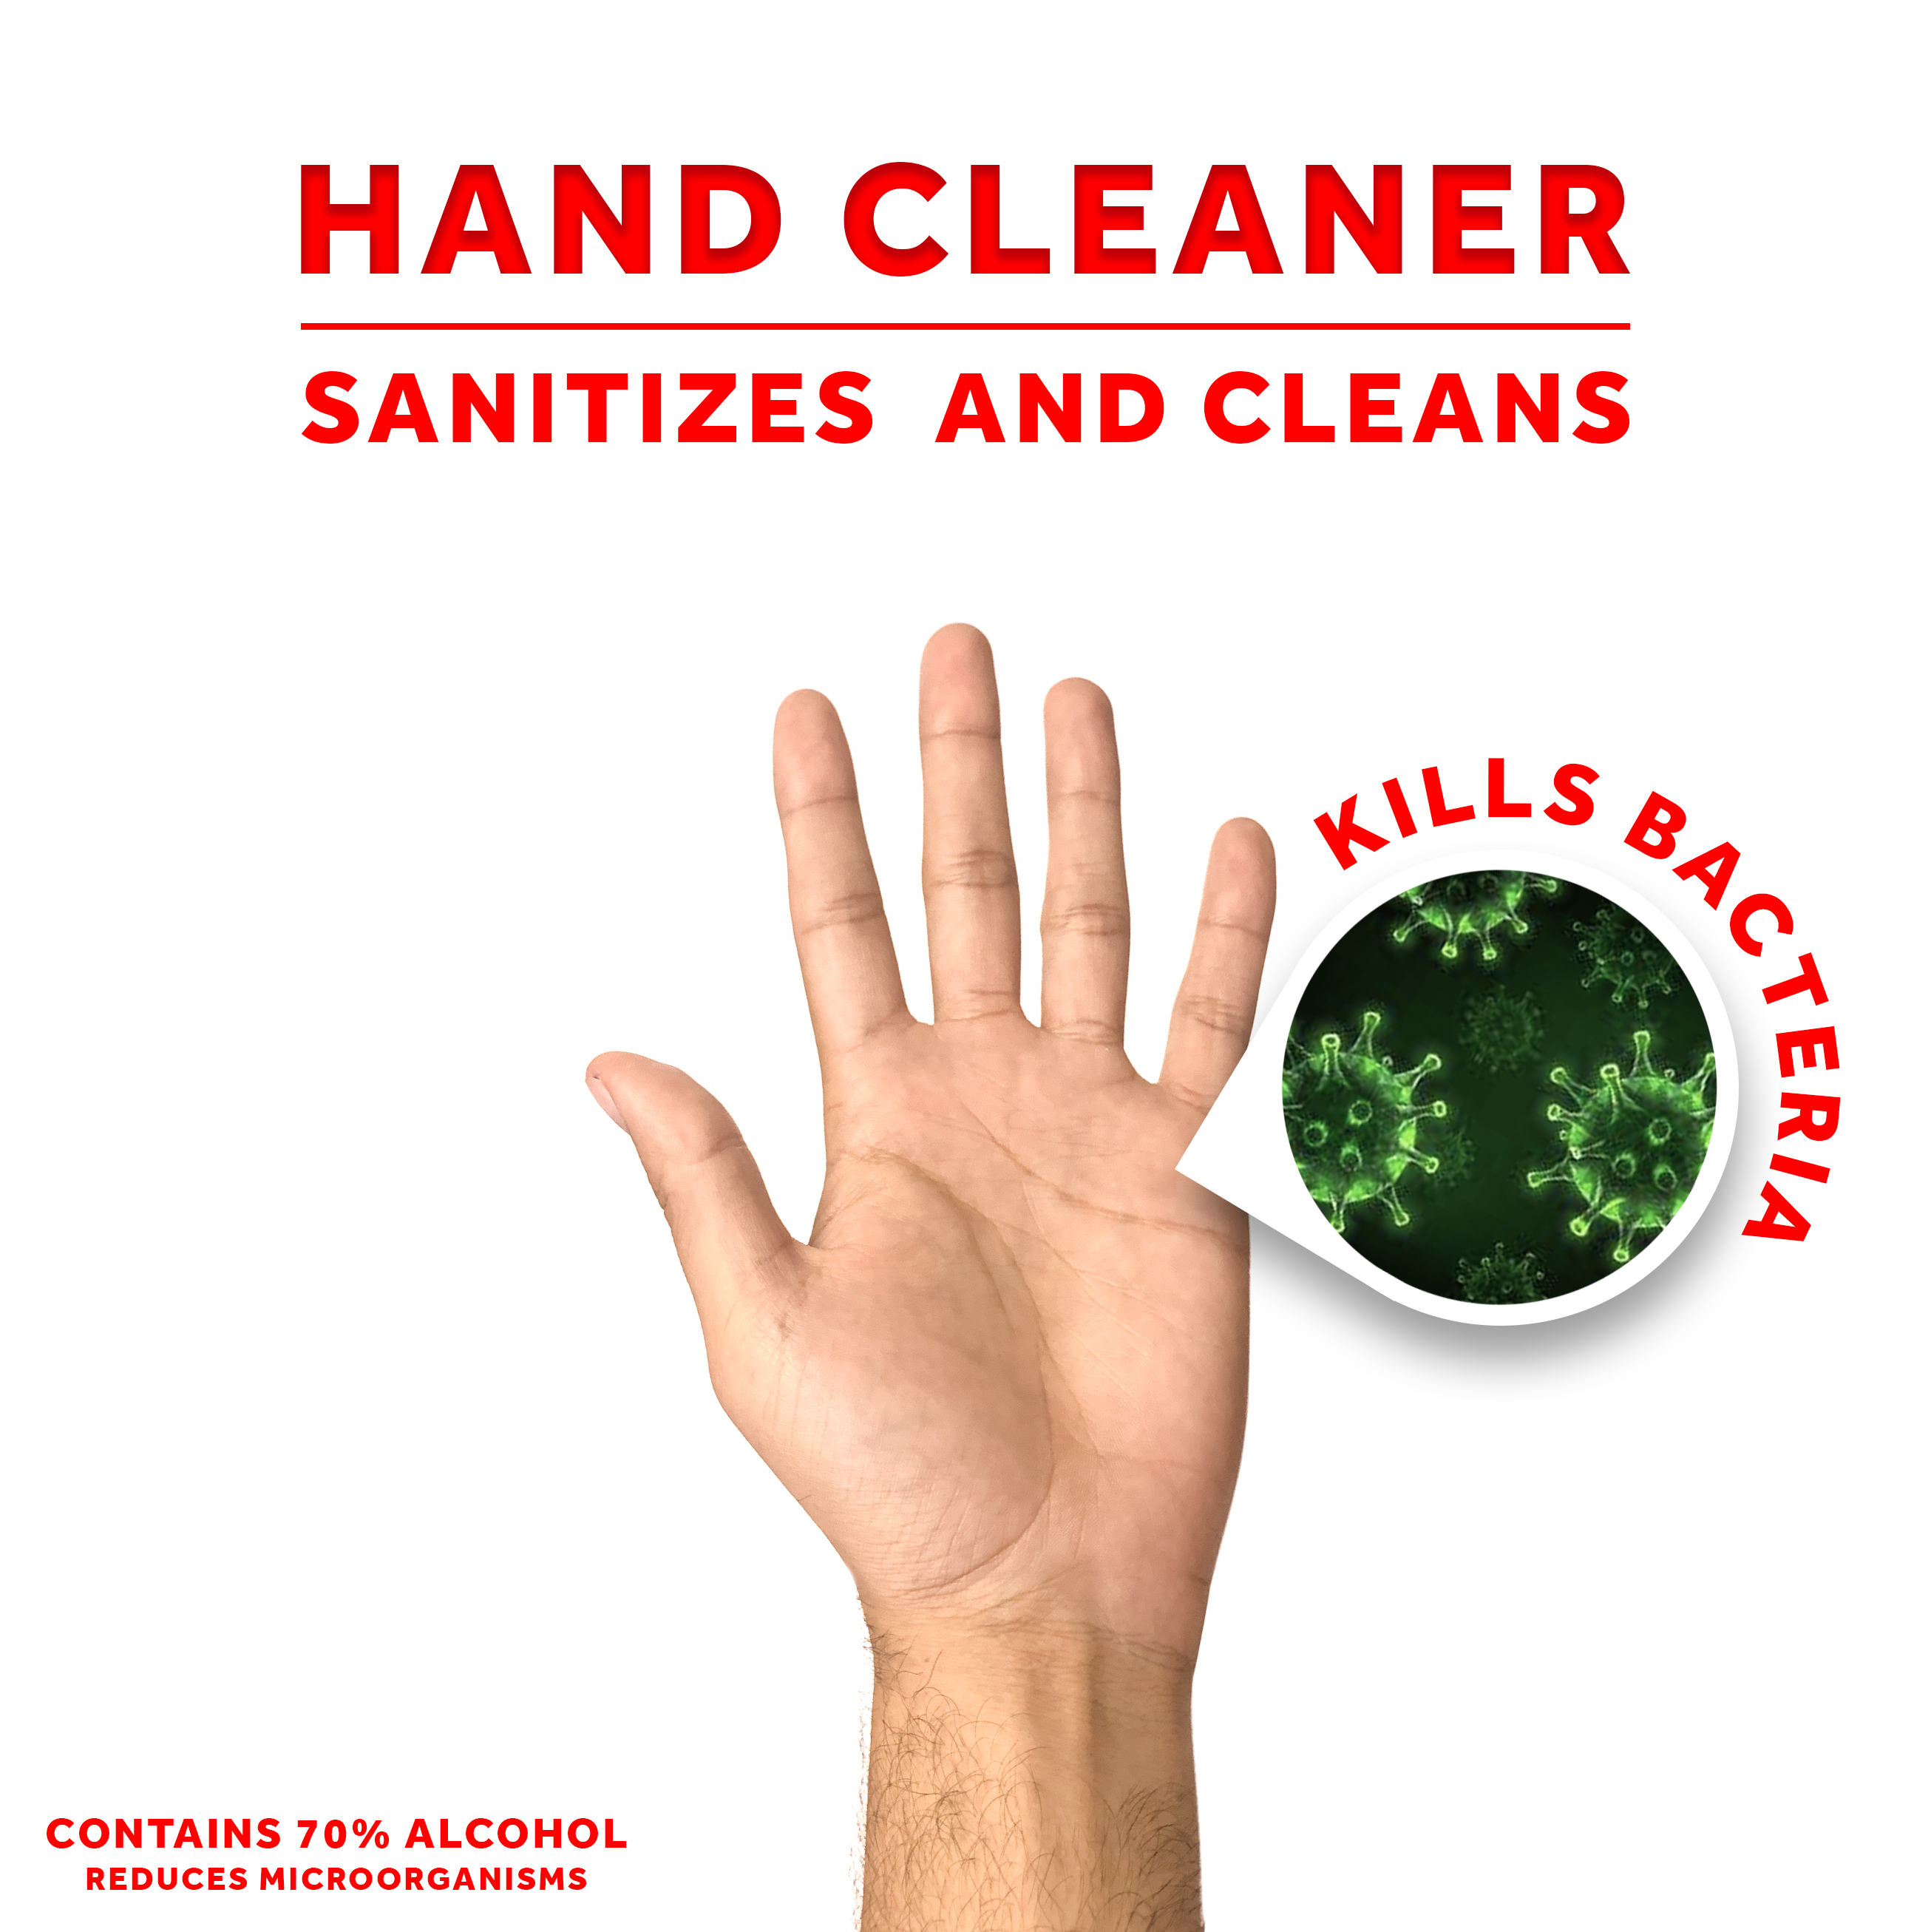 hand-cleaner-hand.jpg